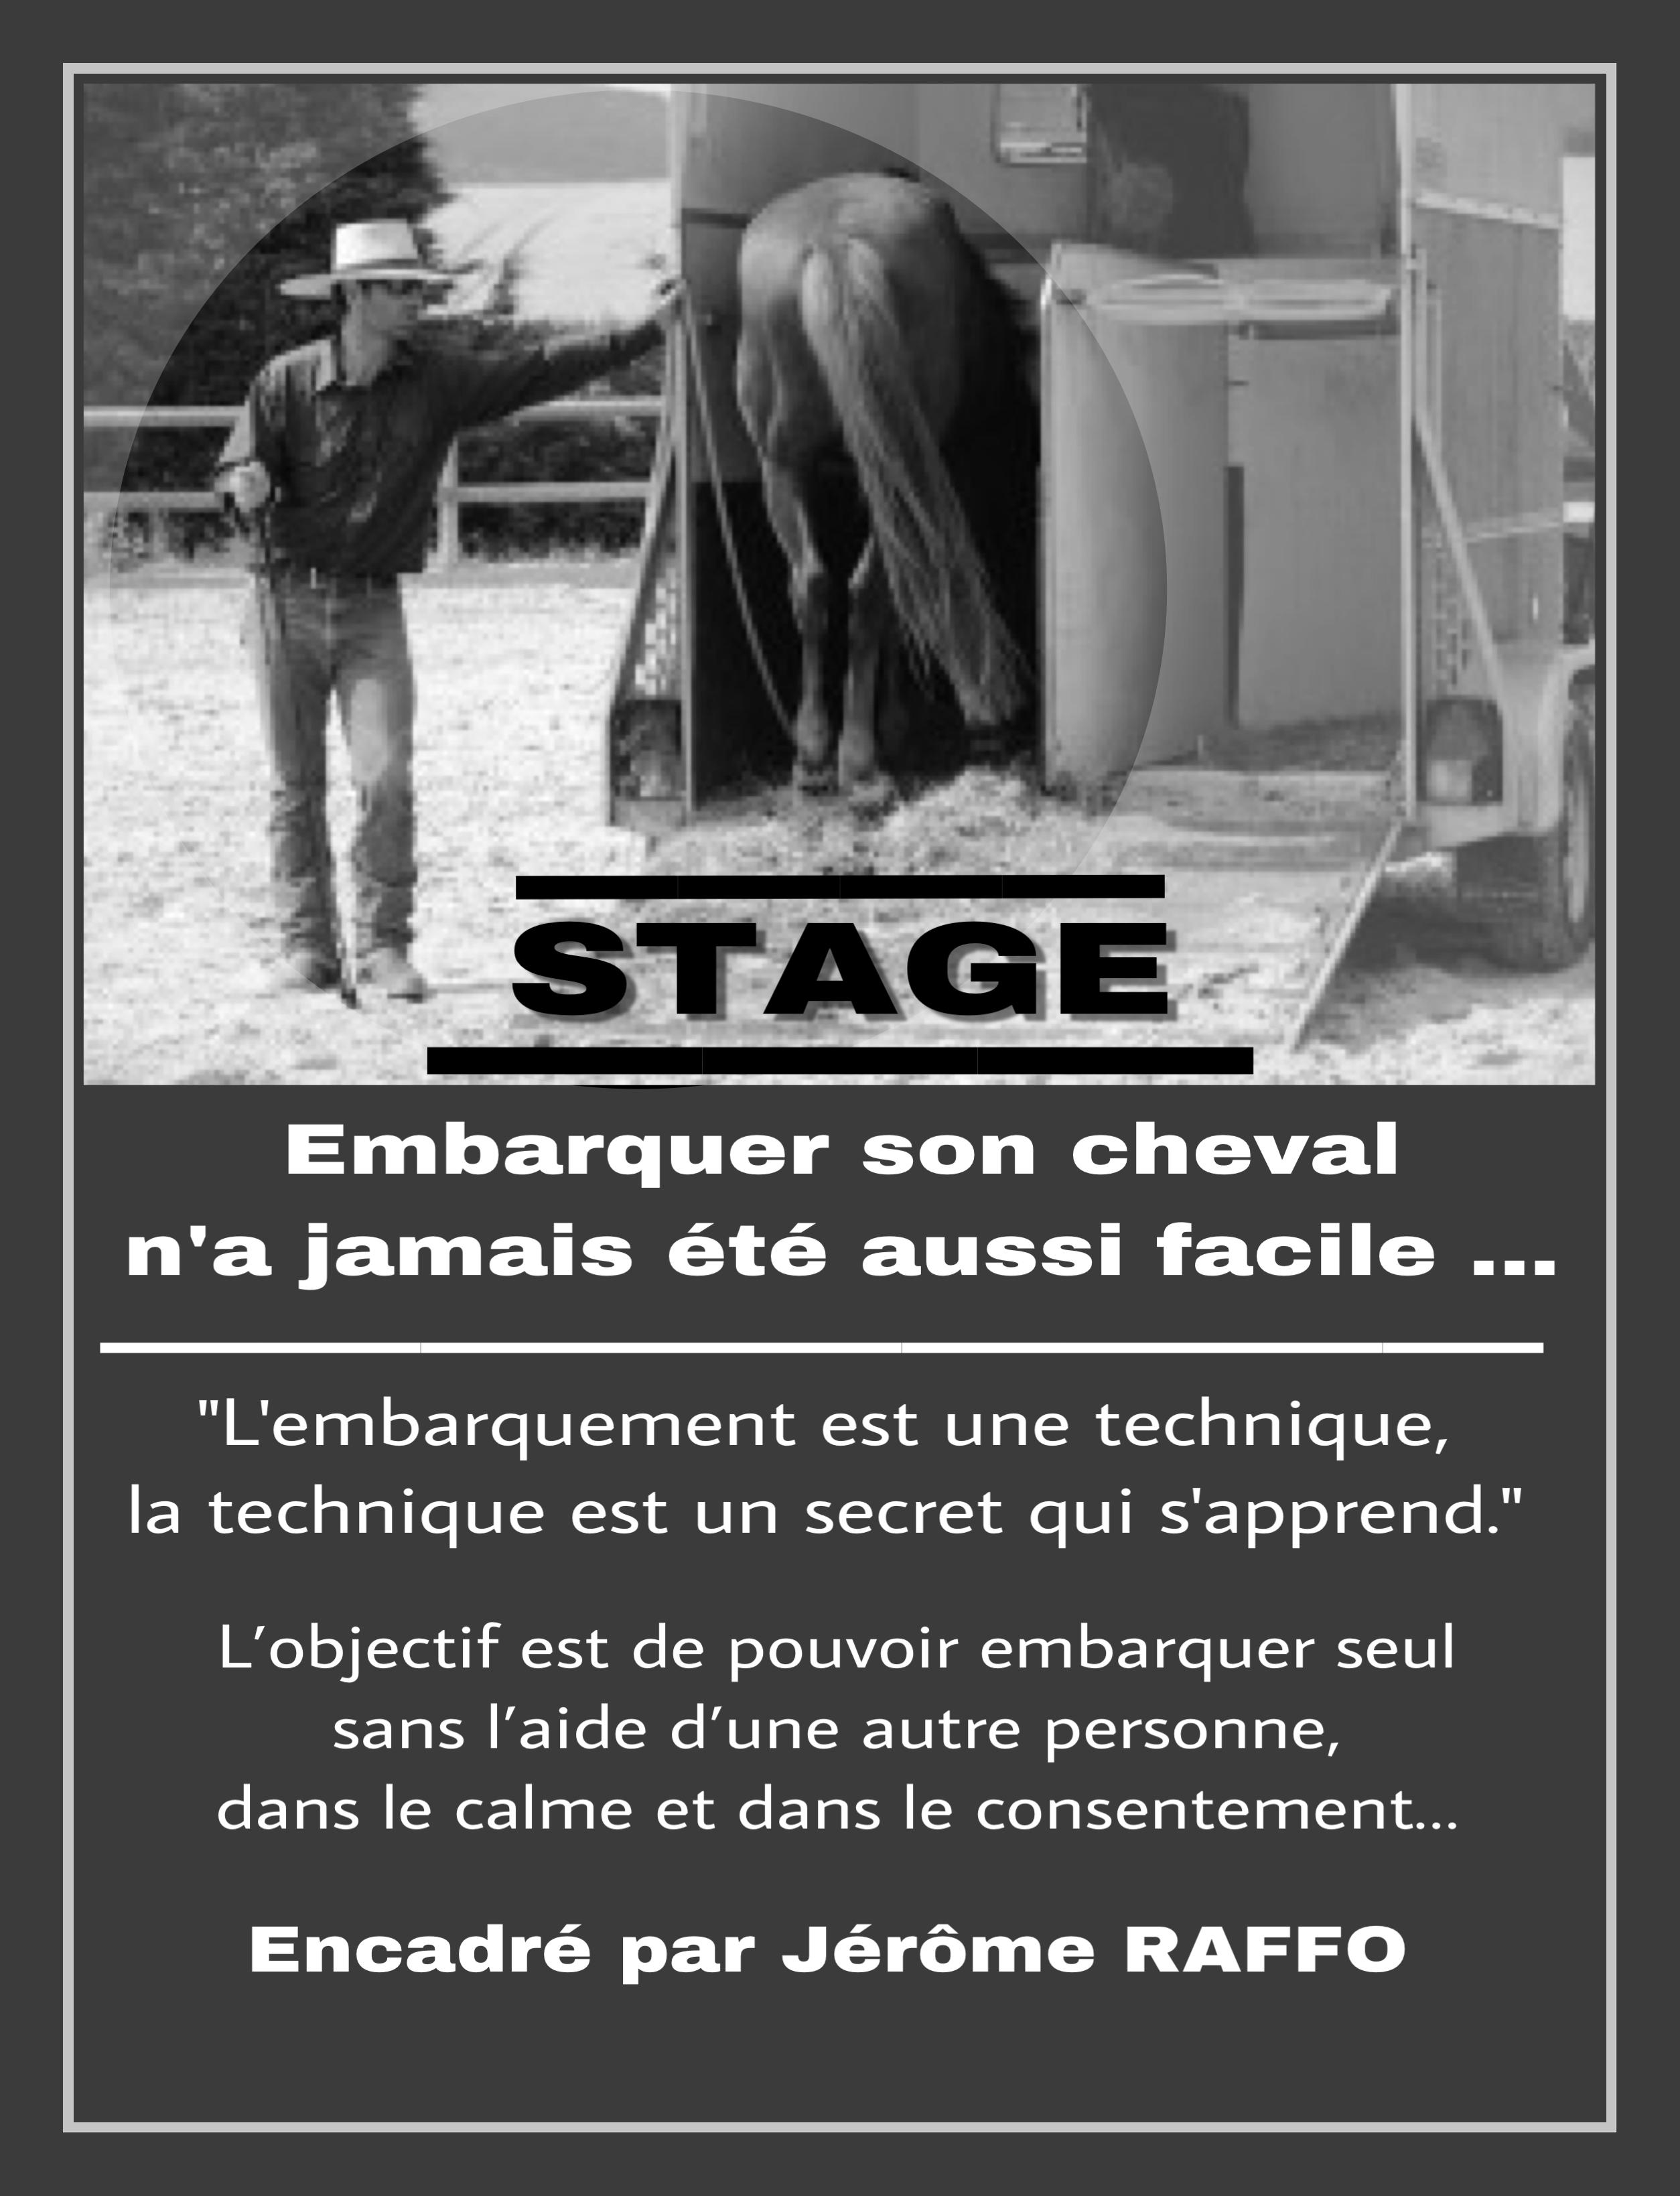 Stage Jerôme Raffo - L'embarquement